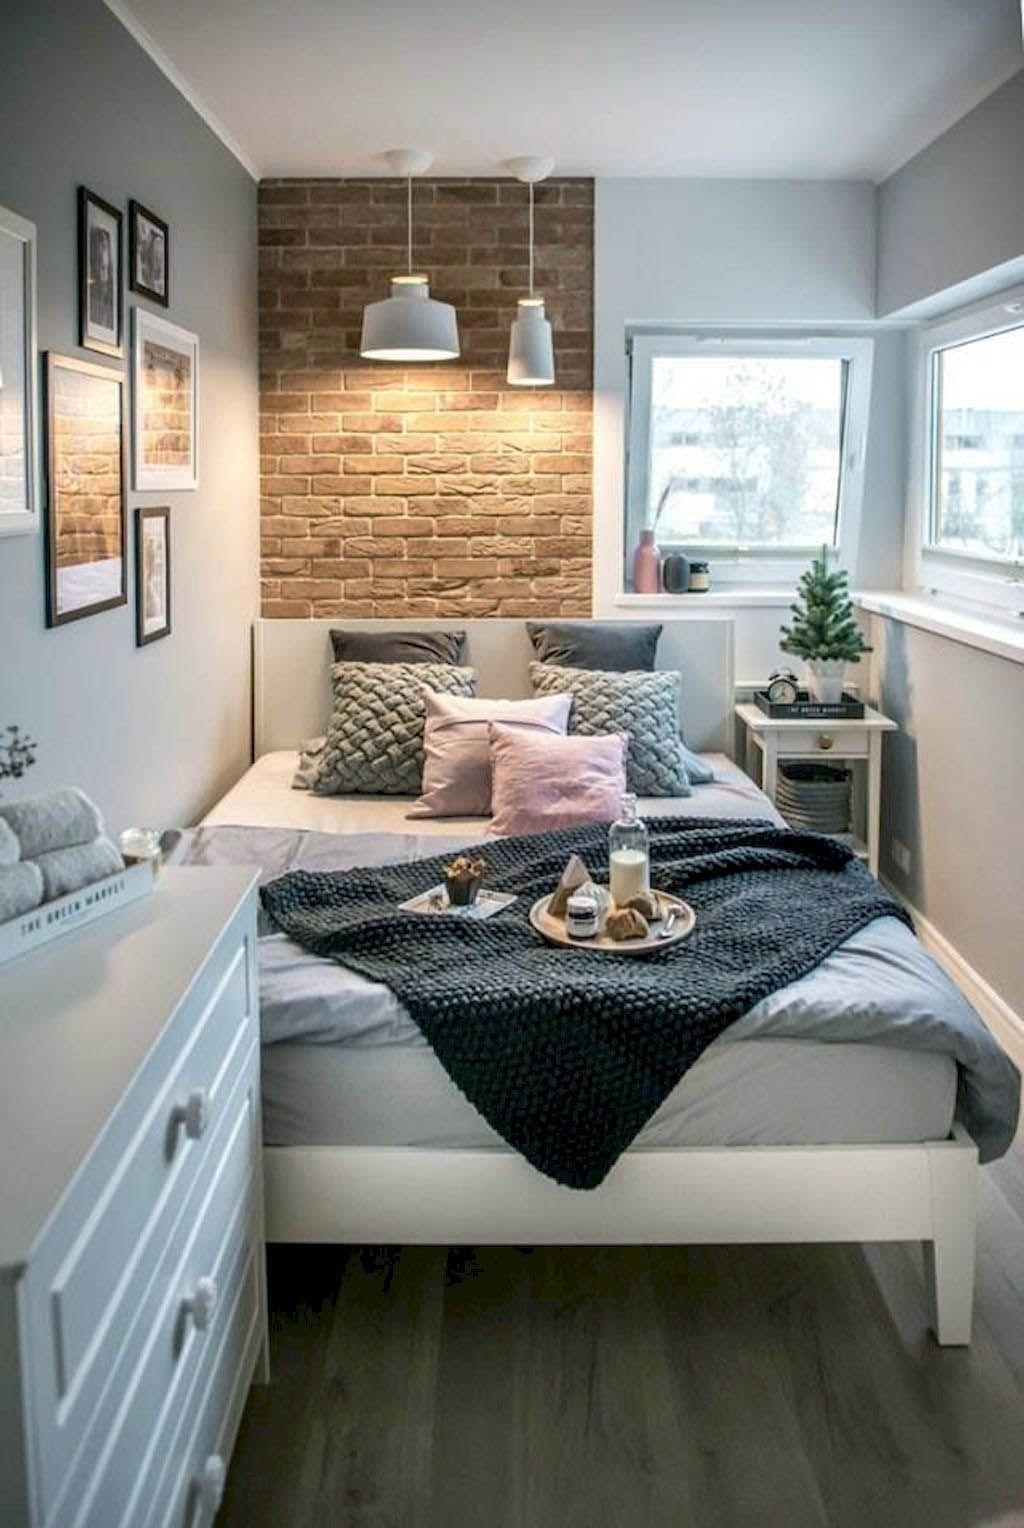 Kmart Bedroom Ideas Guest Rooms & Kmart Bedroom Ideas#bedroom #guest #ideas #kmart… In 2020   Small Guest Bedroom, Small Apartment Bedrooms, Small Bedroom Ideas For Couples